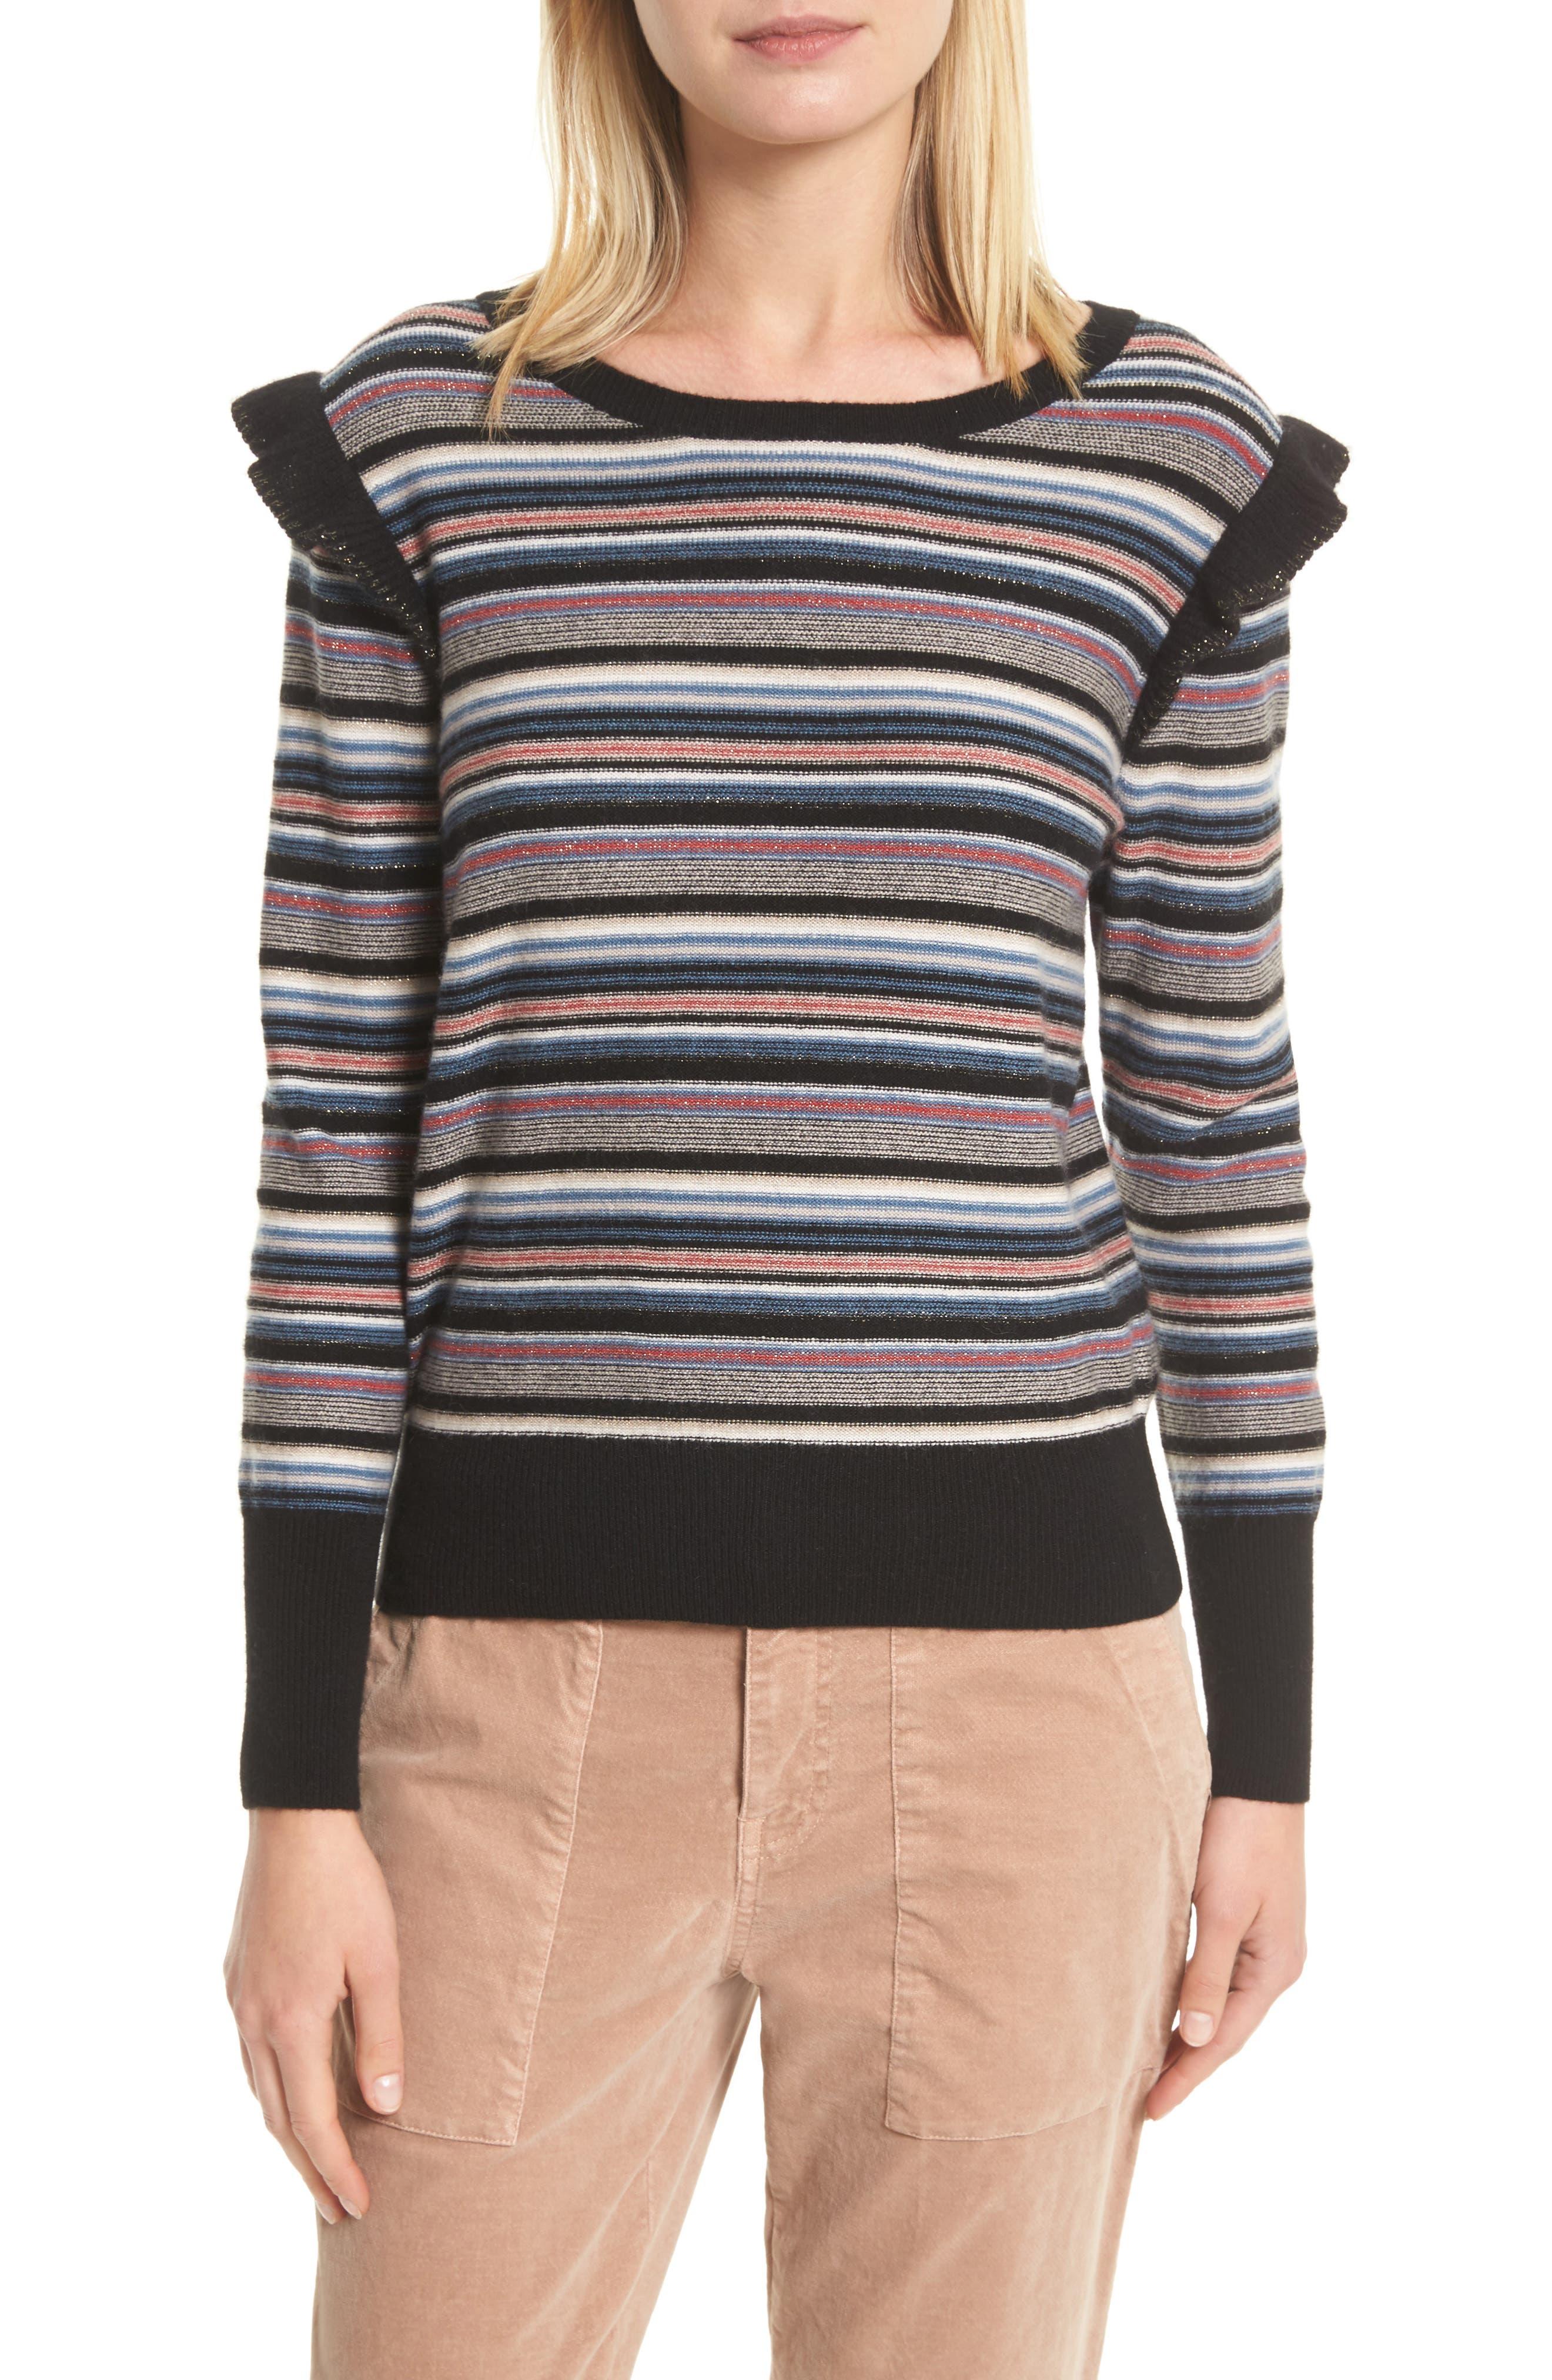 Cais C Stripe Wool & Cashmere Sweater,                             Main thumbnail 1, color,                             001